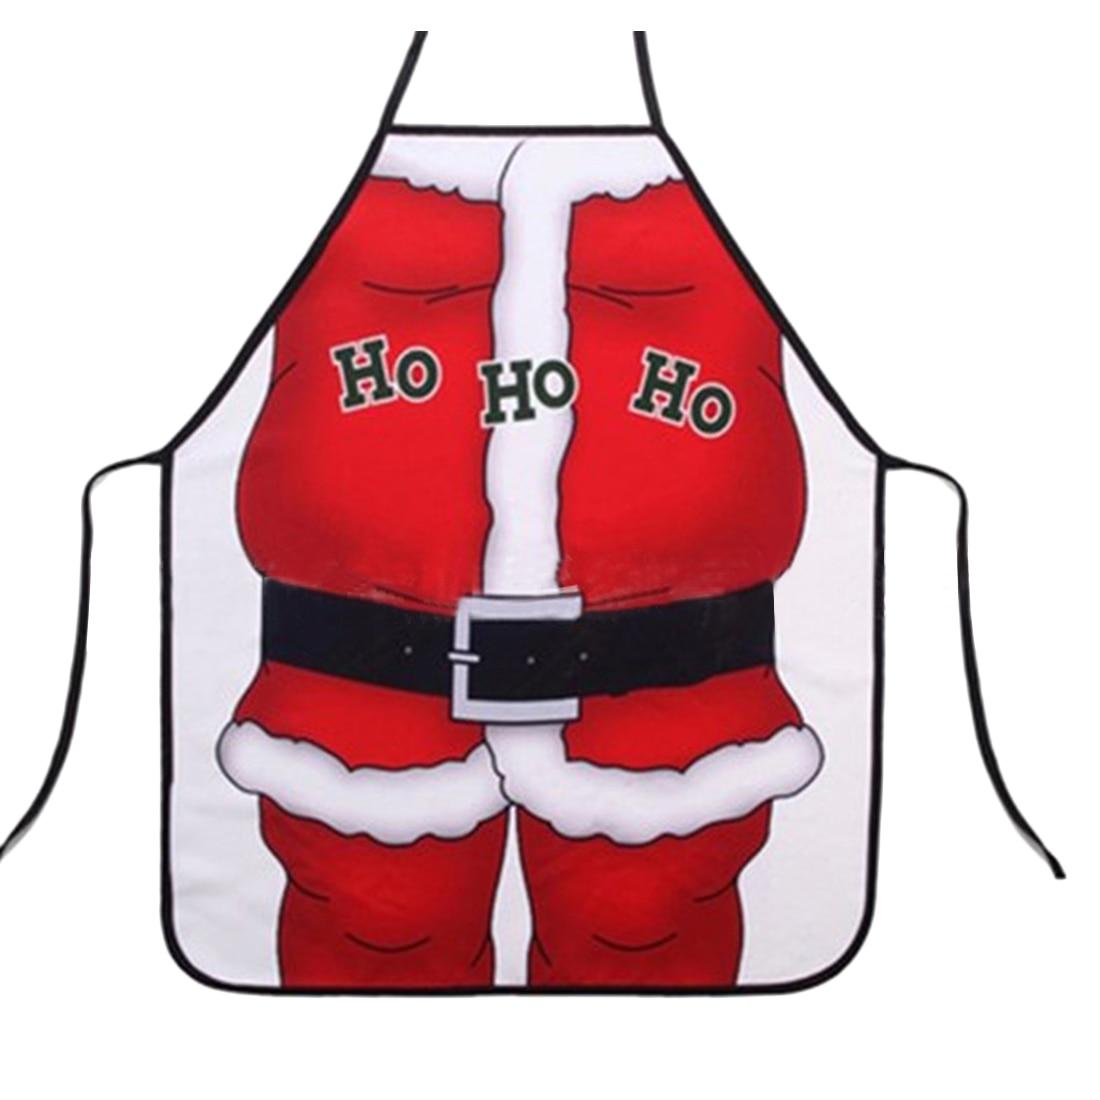 kitchen apron christmas Cartoon Santa Claus Apron Adult Free Size Pinafore Kitchen Cooking Tool christmas supplies 2018  - Red